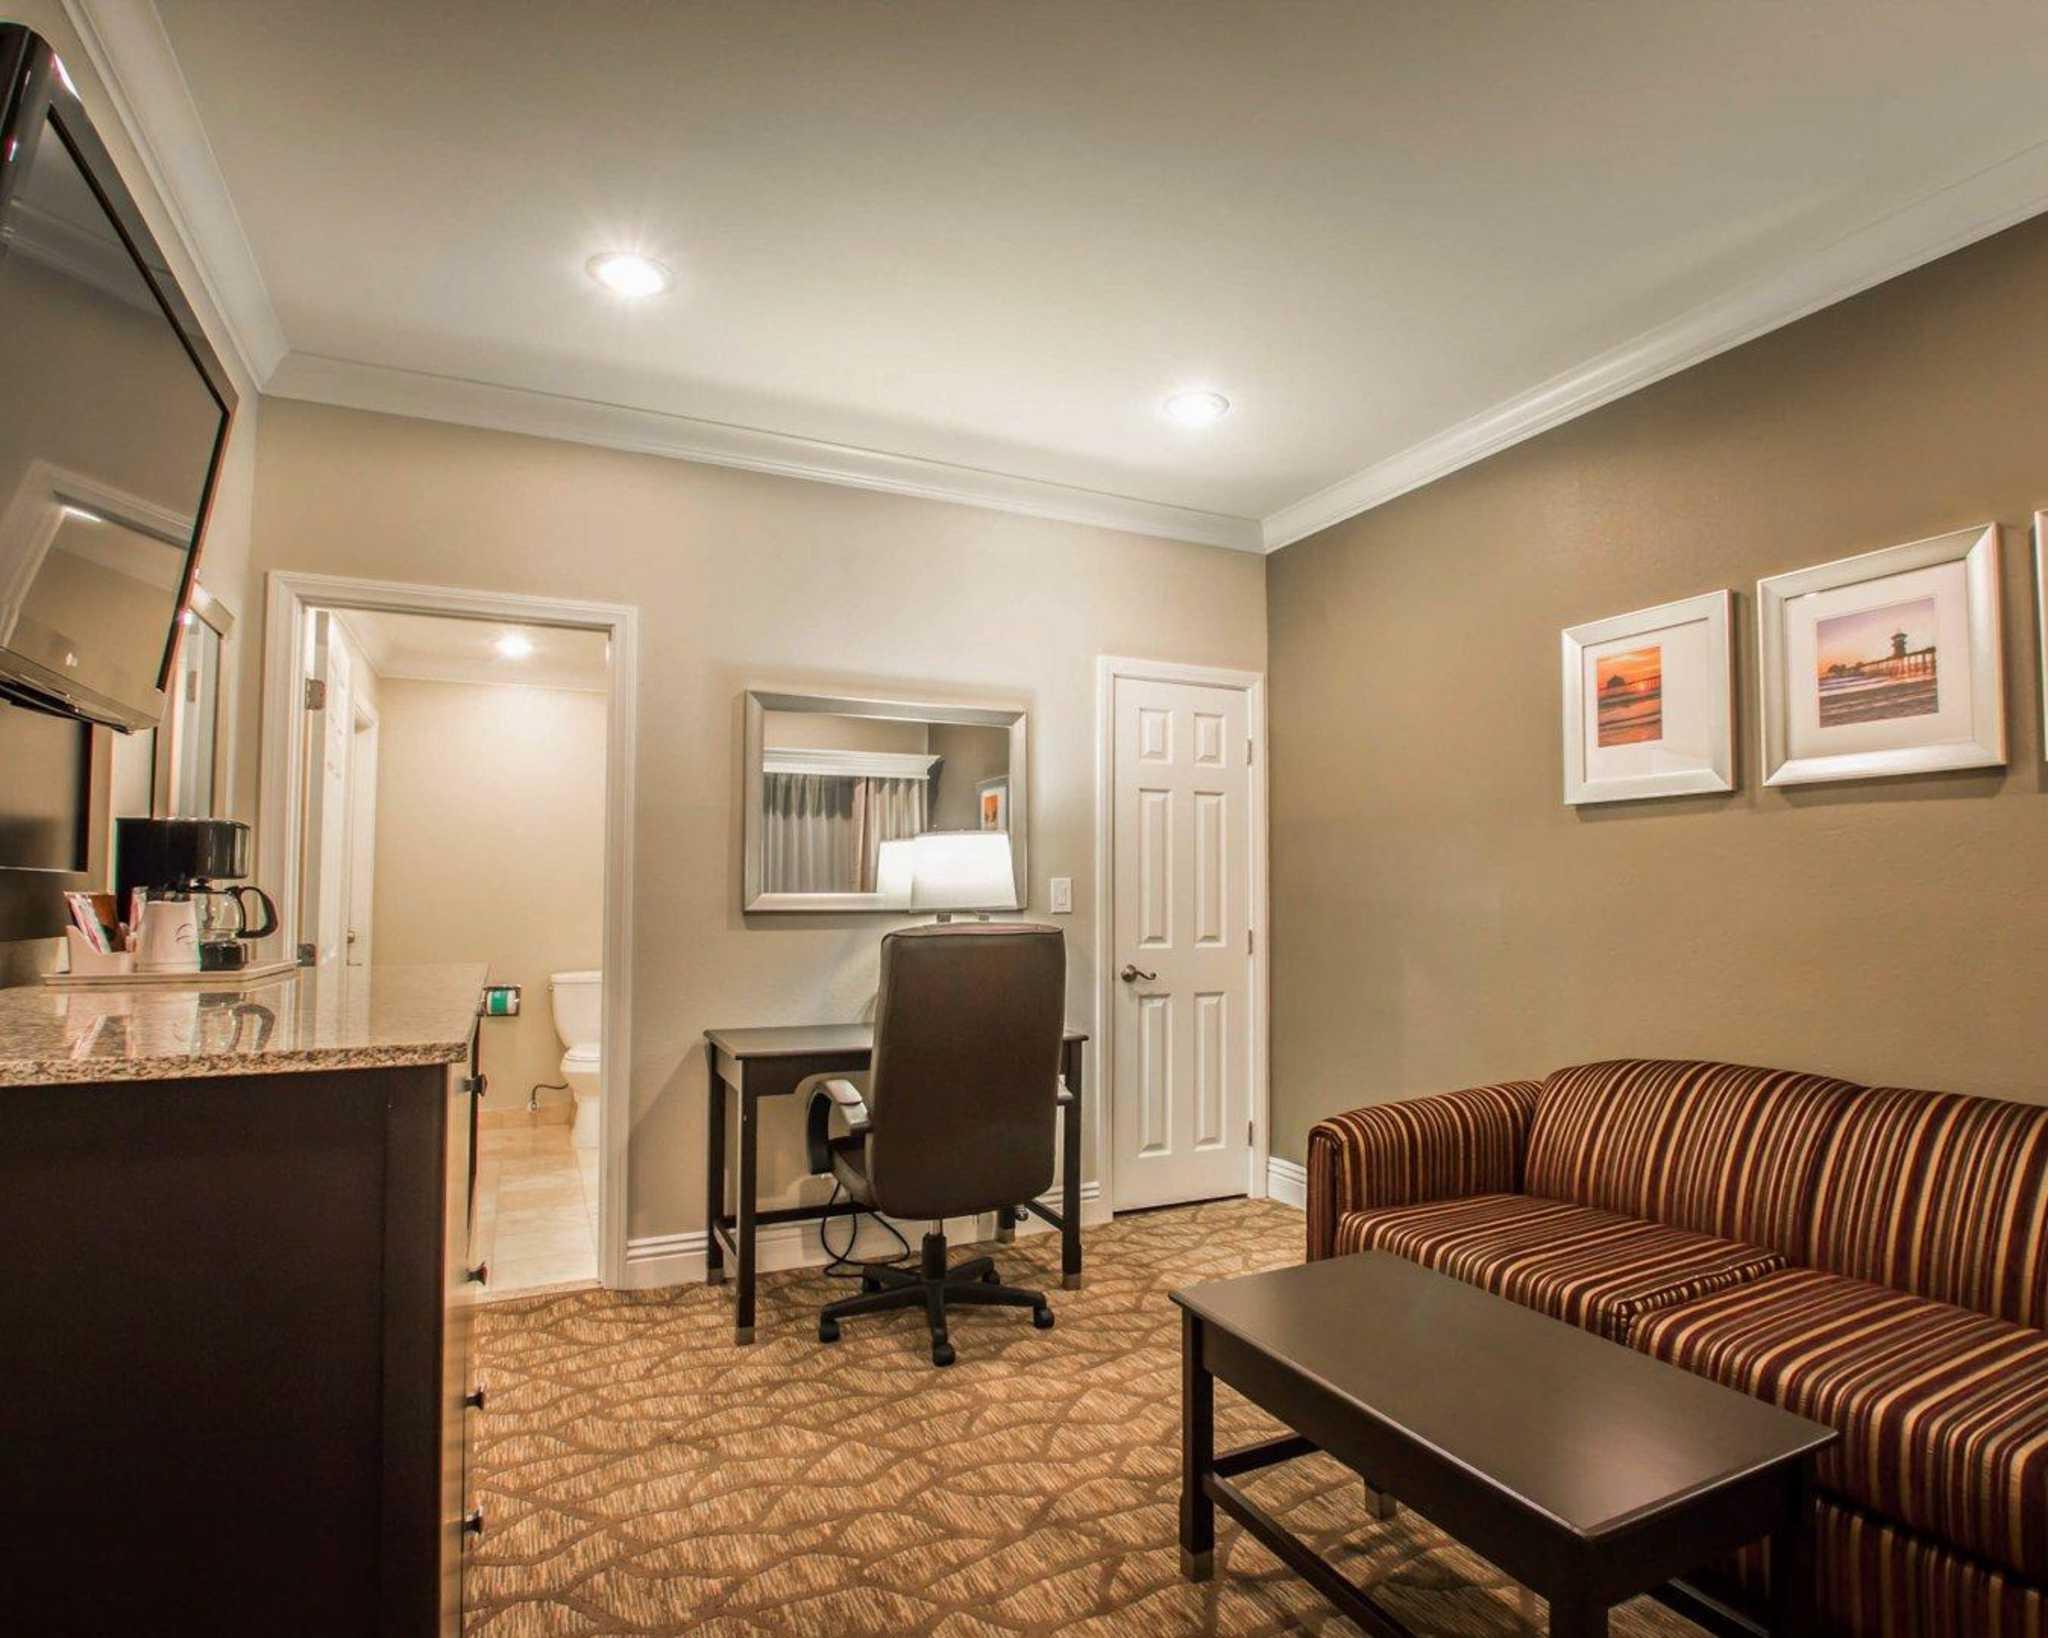 Comfort Suites Huntington Beach image 26